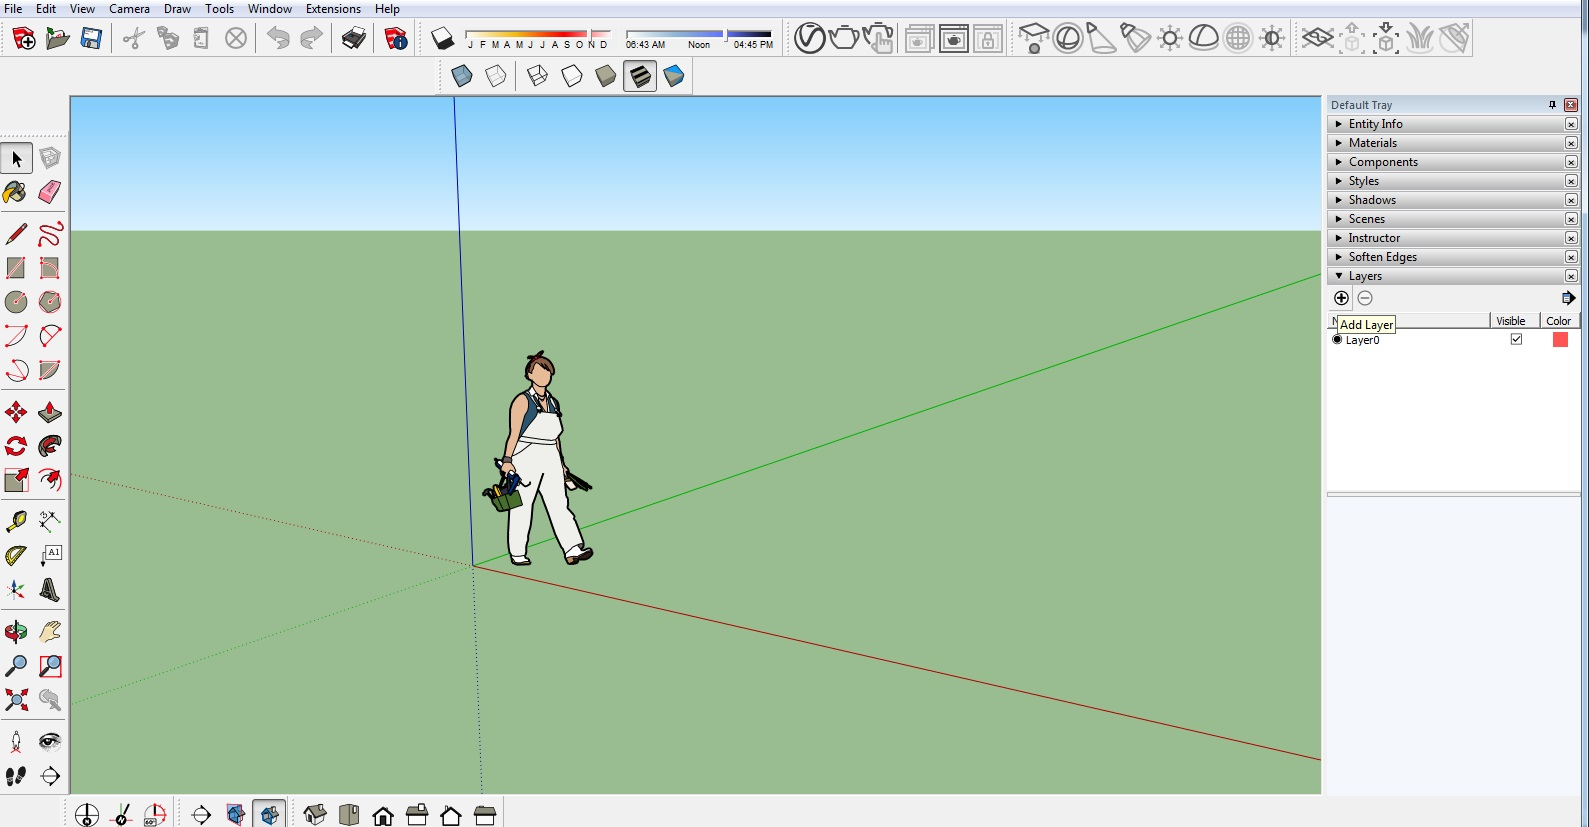 Sketchup - Jak dodać warstwy? Poradnik, tutorial - Blog